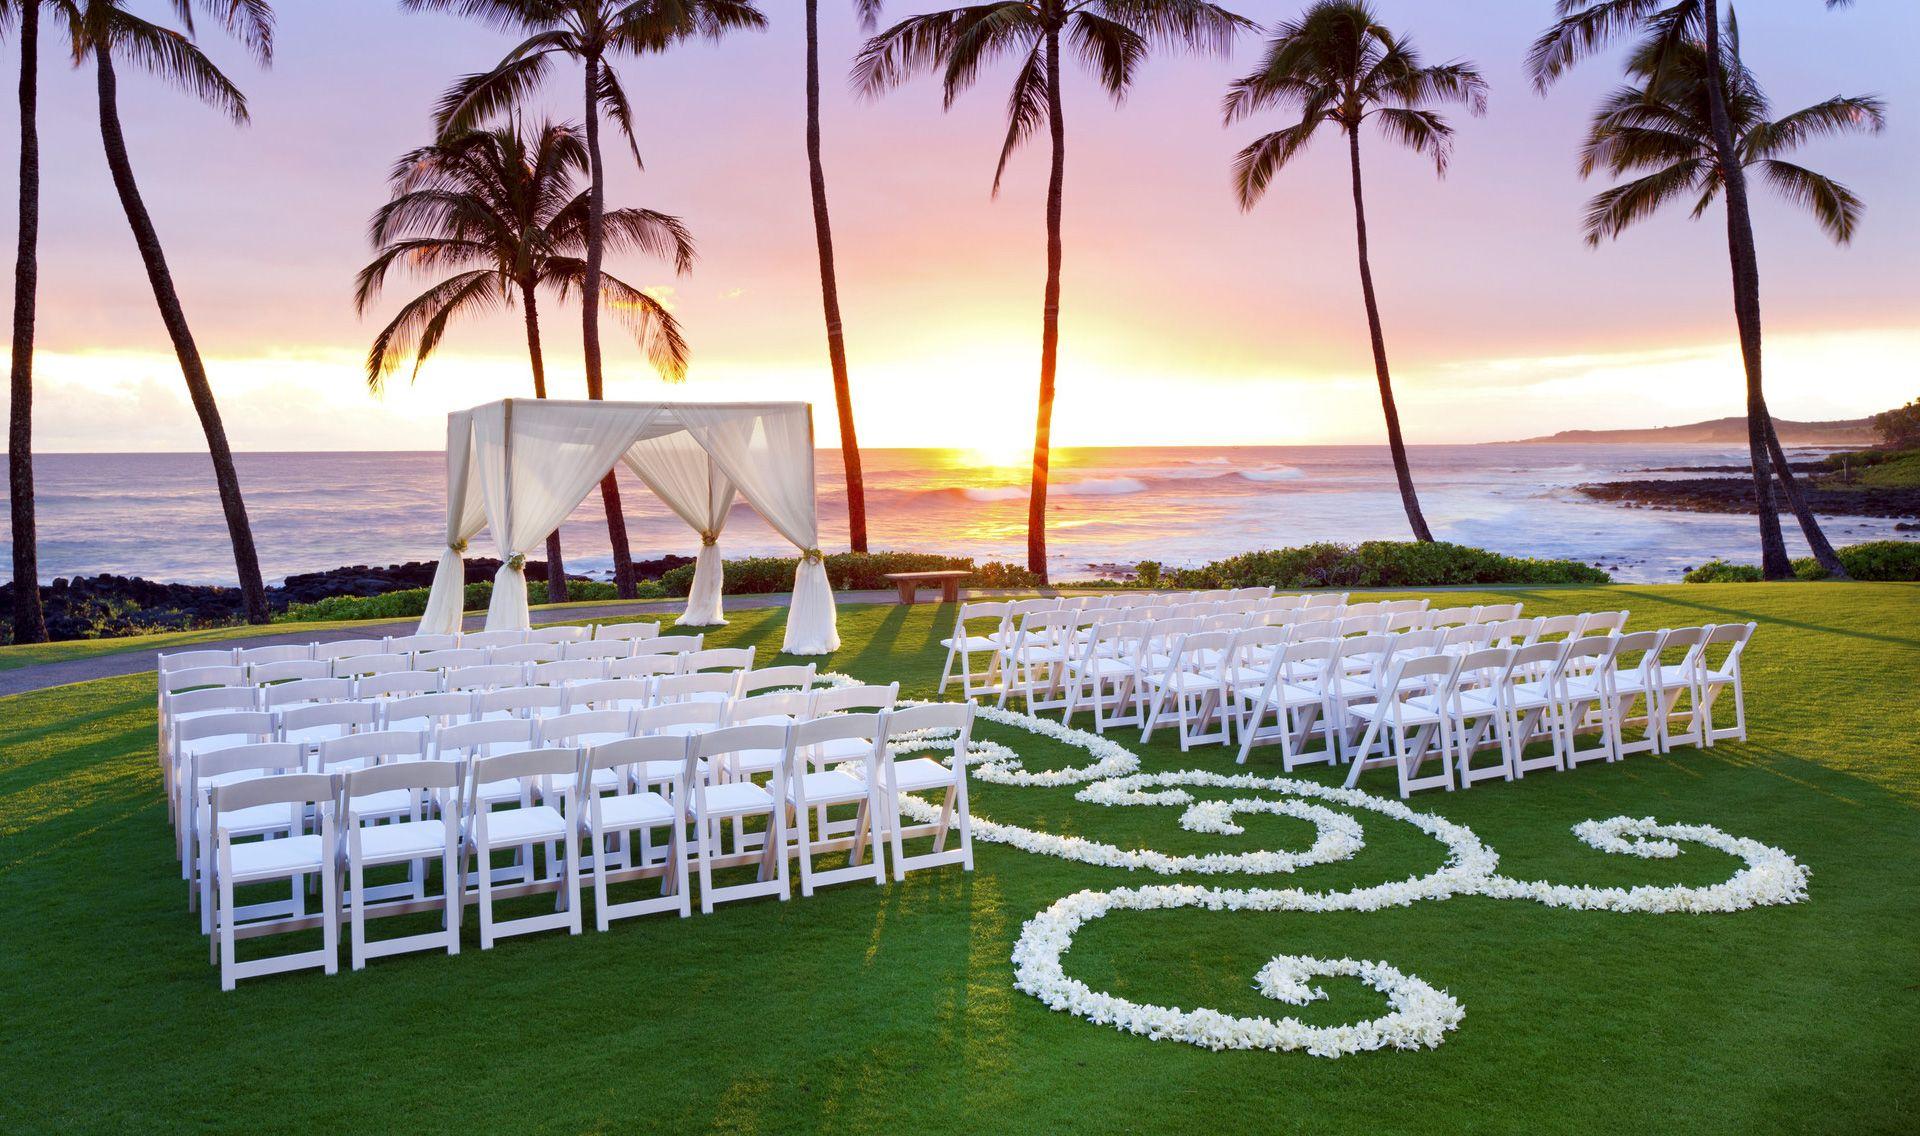 Pin by sophia campbell on wedding ideas Sunset beach